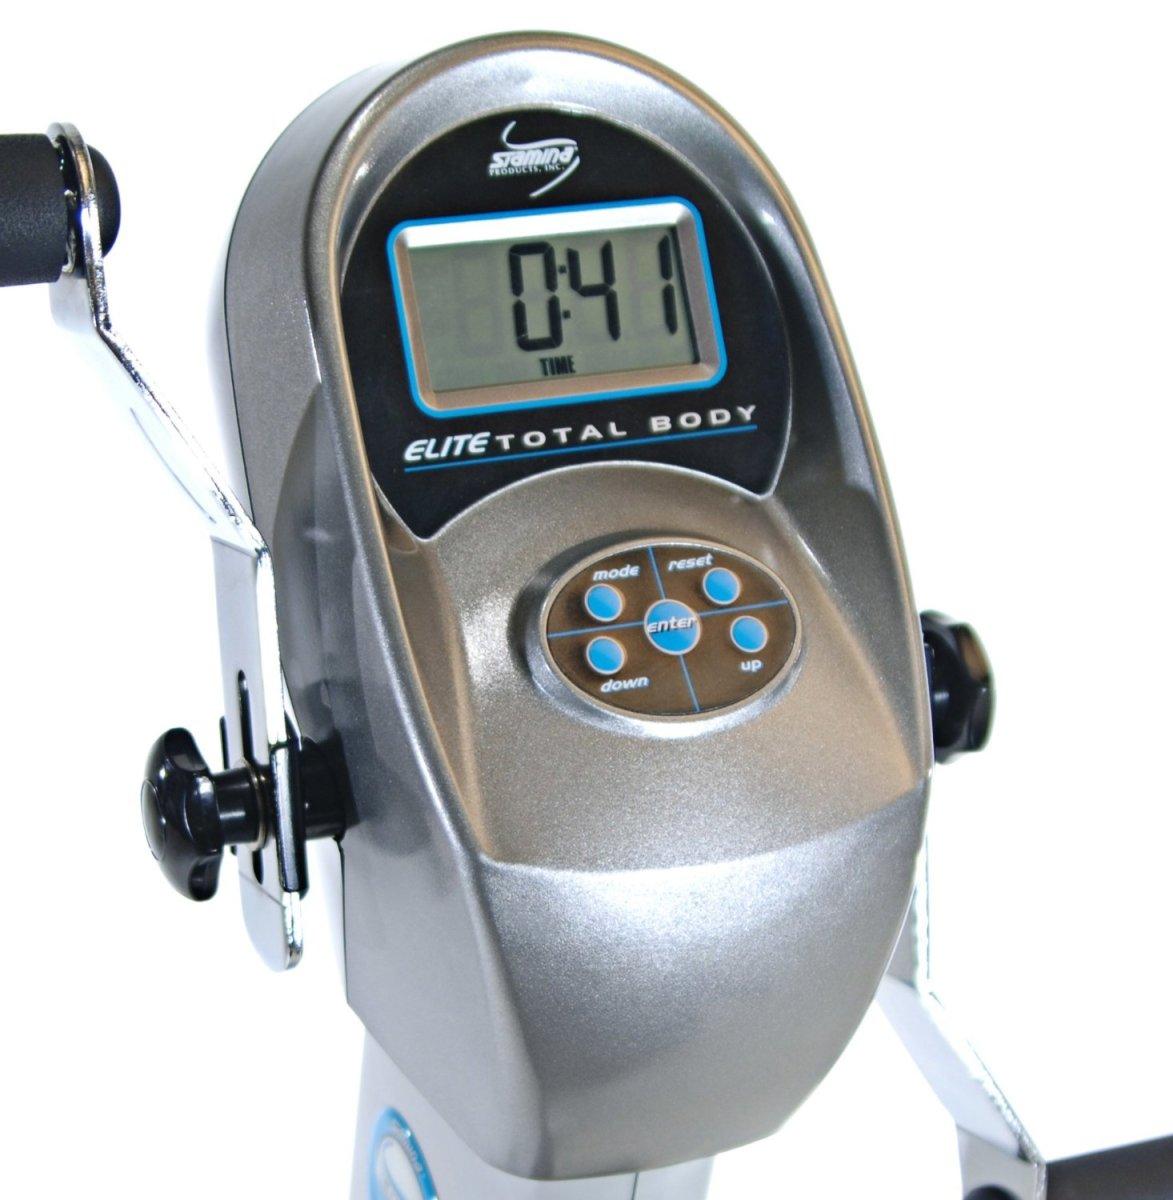 Stamina Elite Total Body Recumbent Exercise Bike console